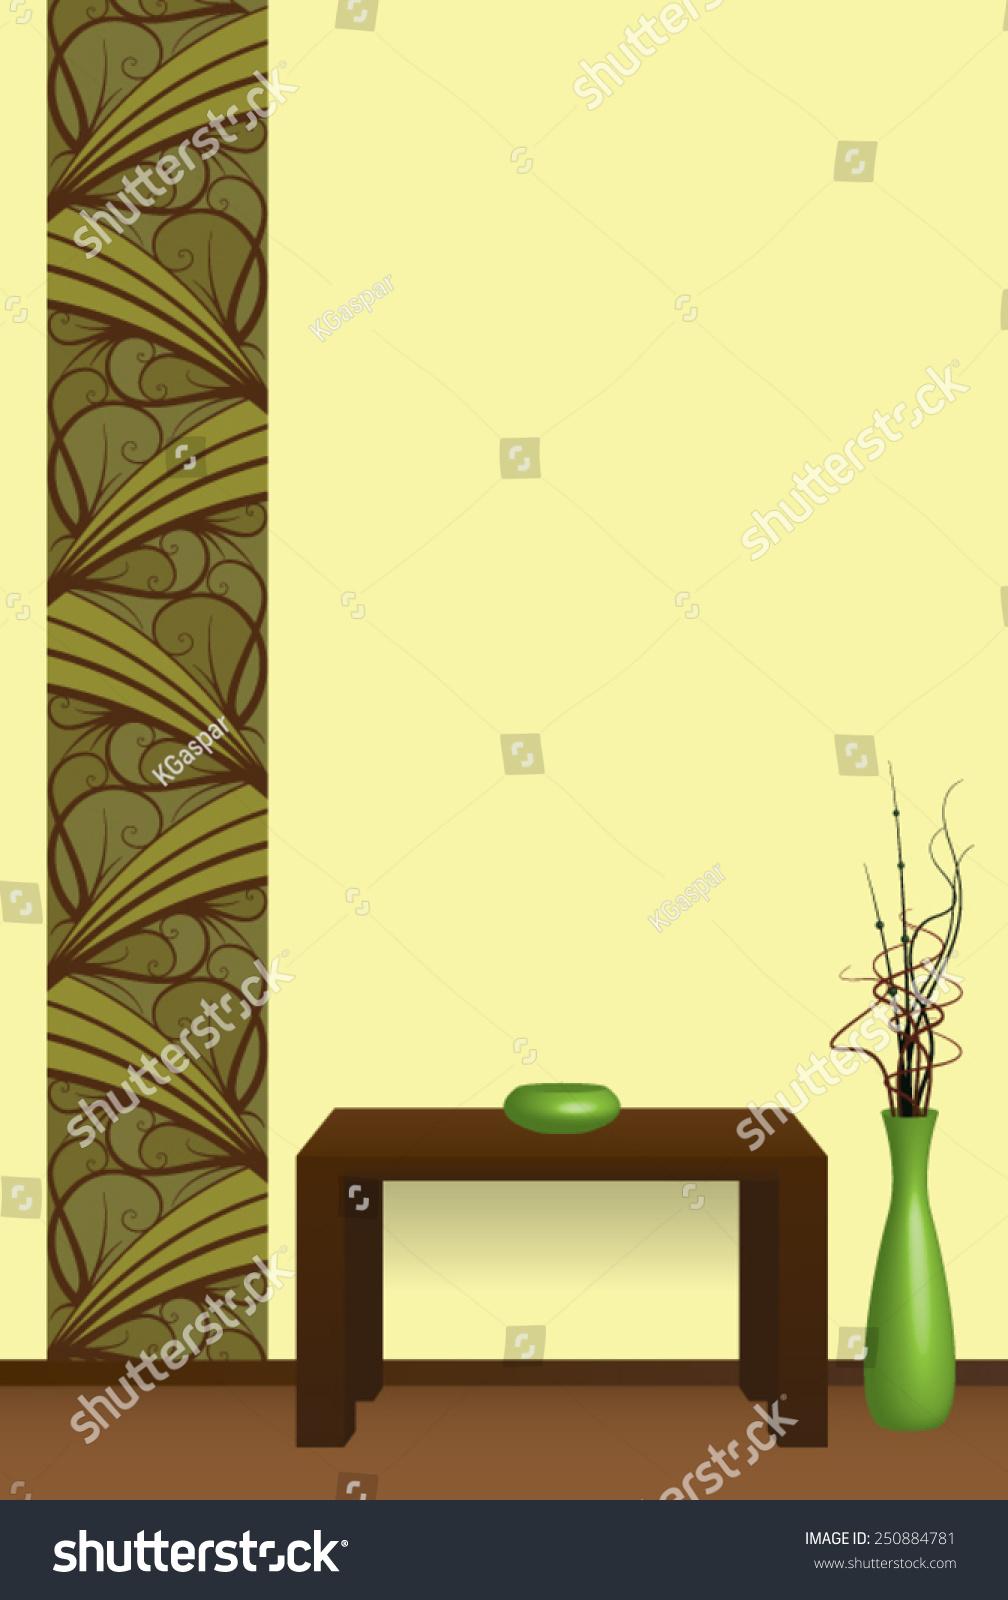 Interior Design Wall Decoration Stock Vector 250884781 - Shutterstock